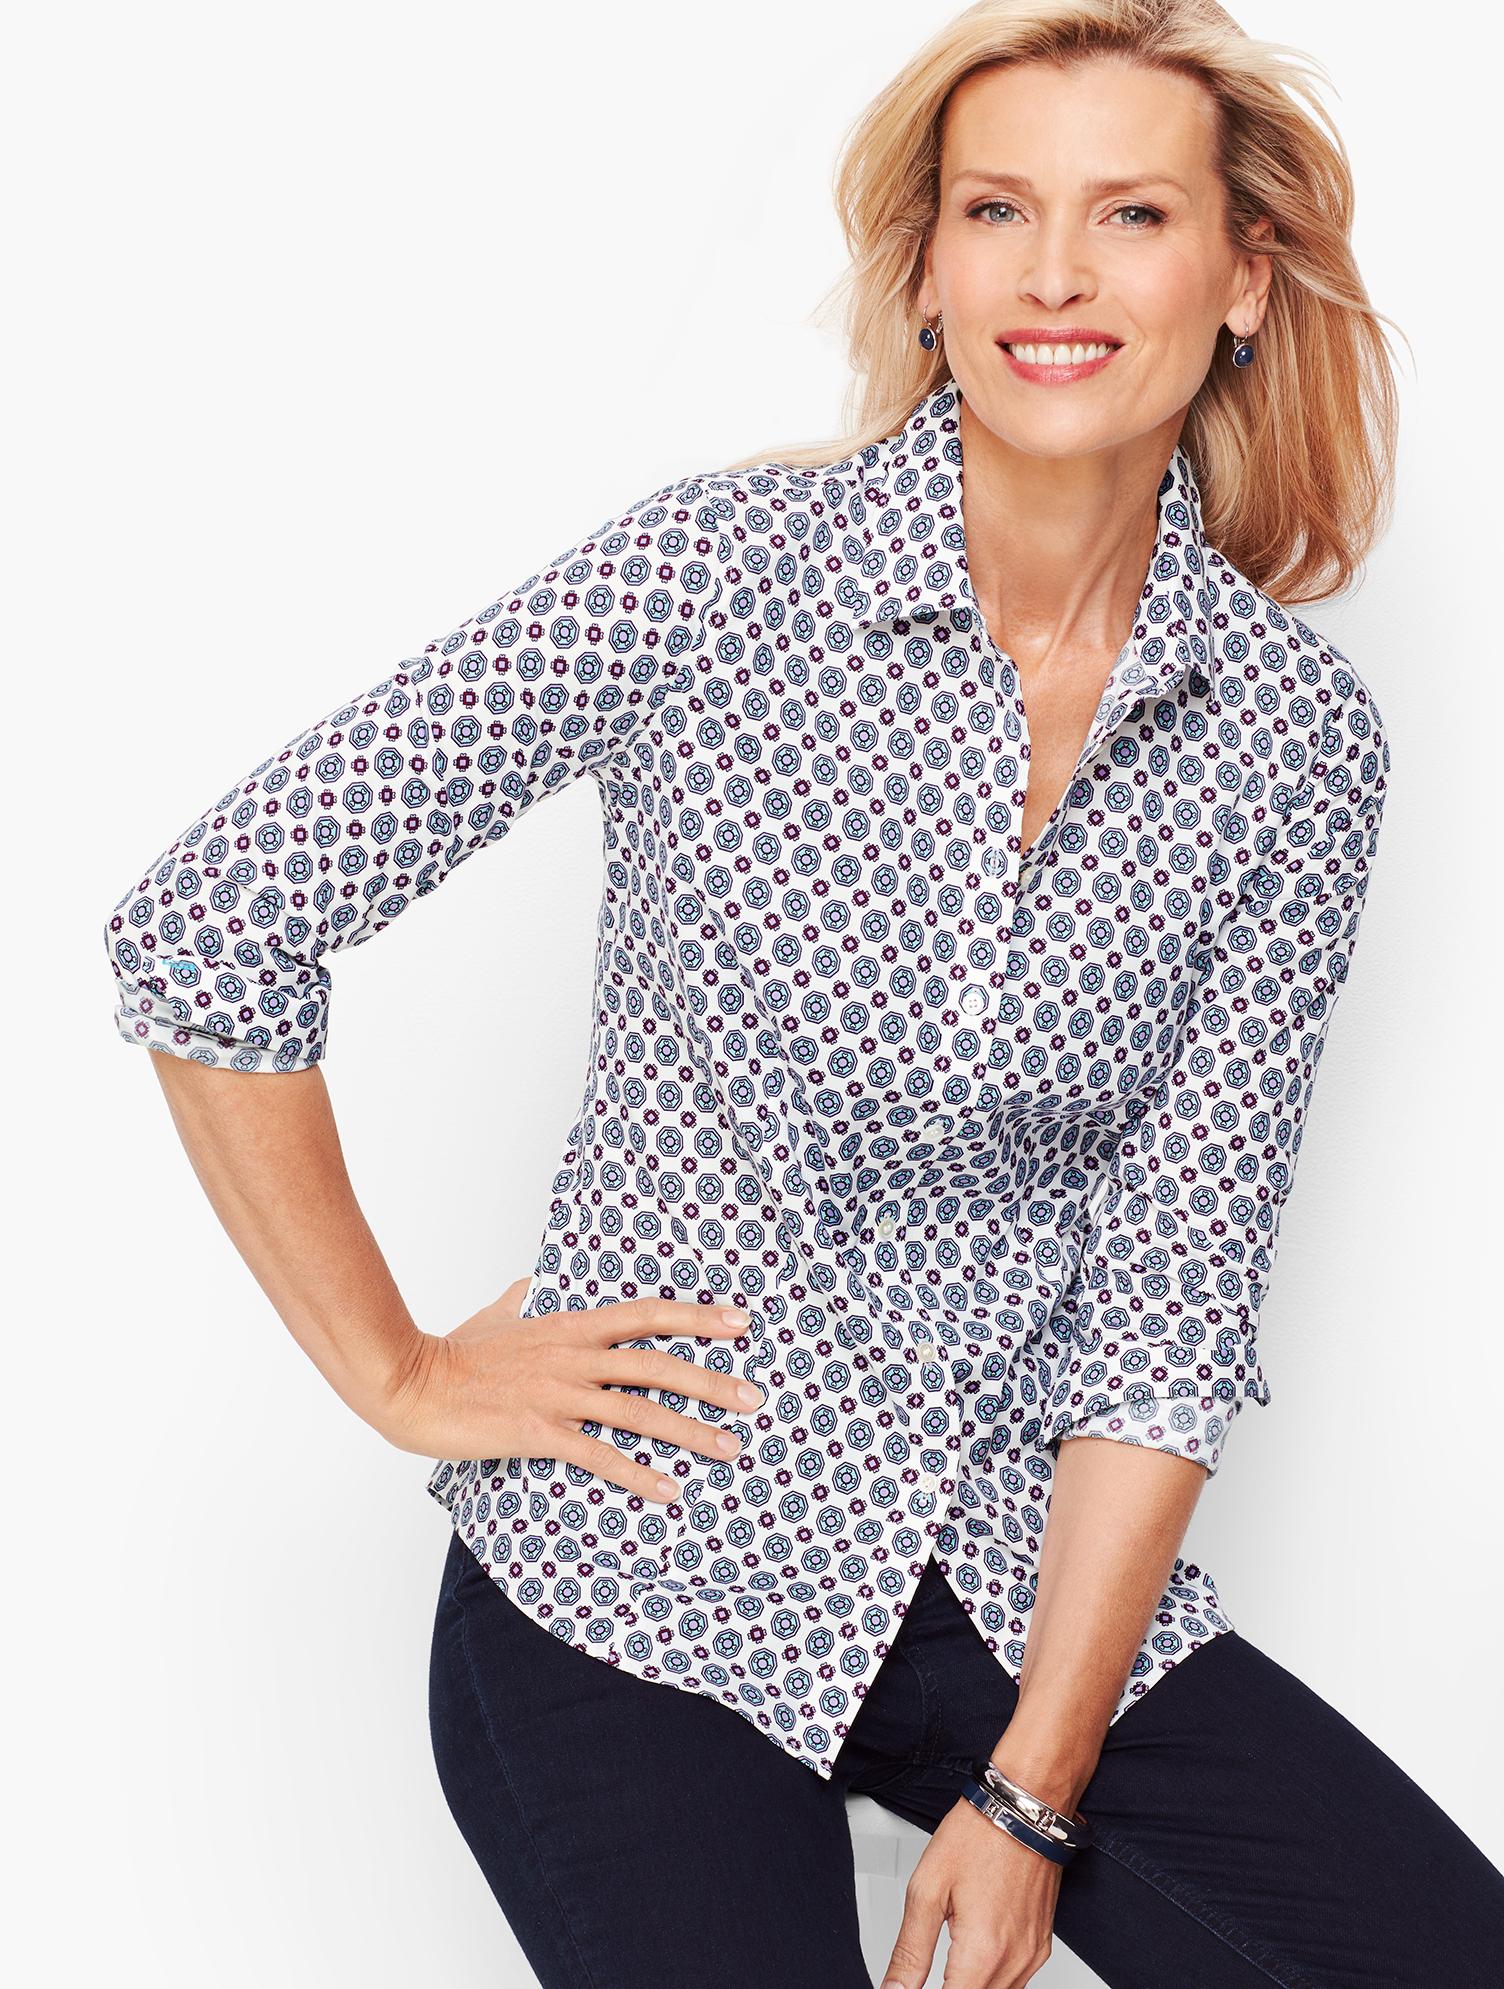 60s Shirts, T-shirt, Blouses, Hippie Shirts Perfect Shirt - Geo Hearts - WHITE-MULTI - 16 - Talbots $59.15 AT vintagedancer.com